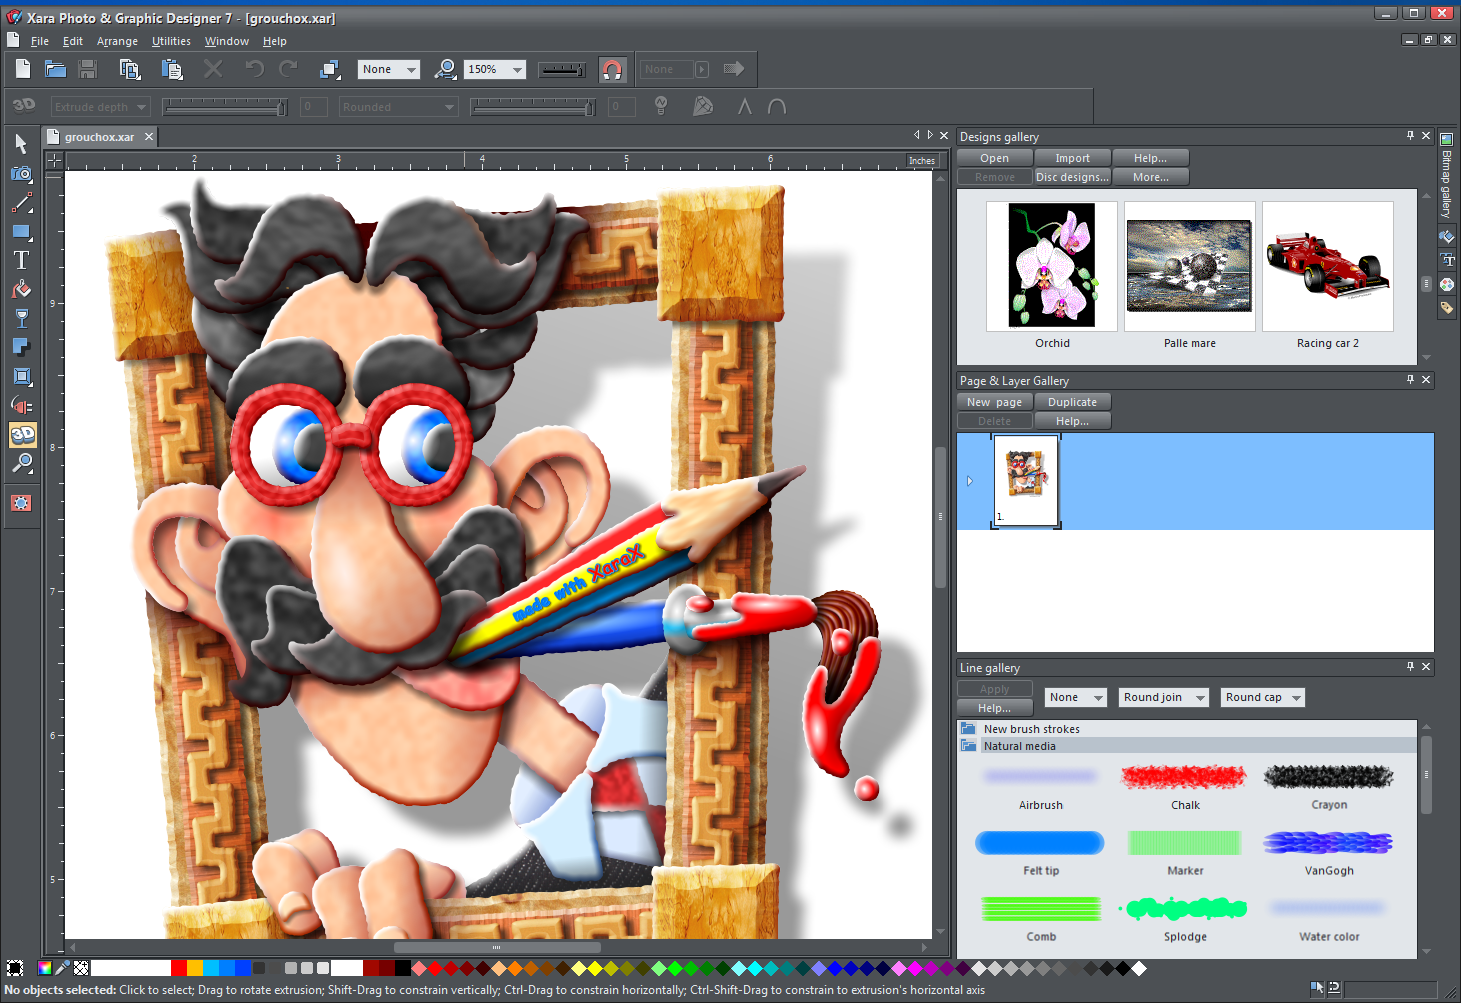 Xara Photo & Graphic Designer FREE Download Graphic